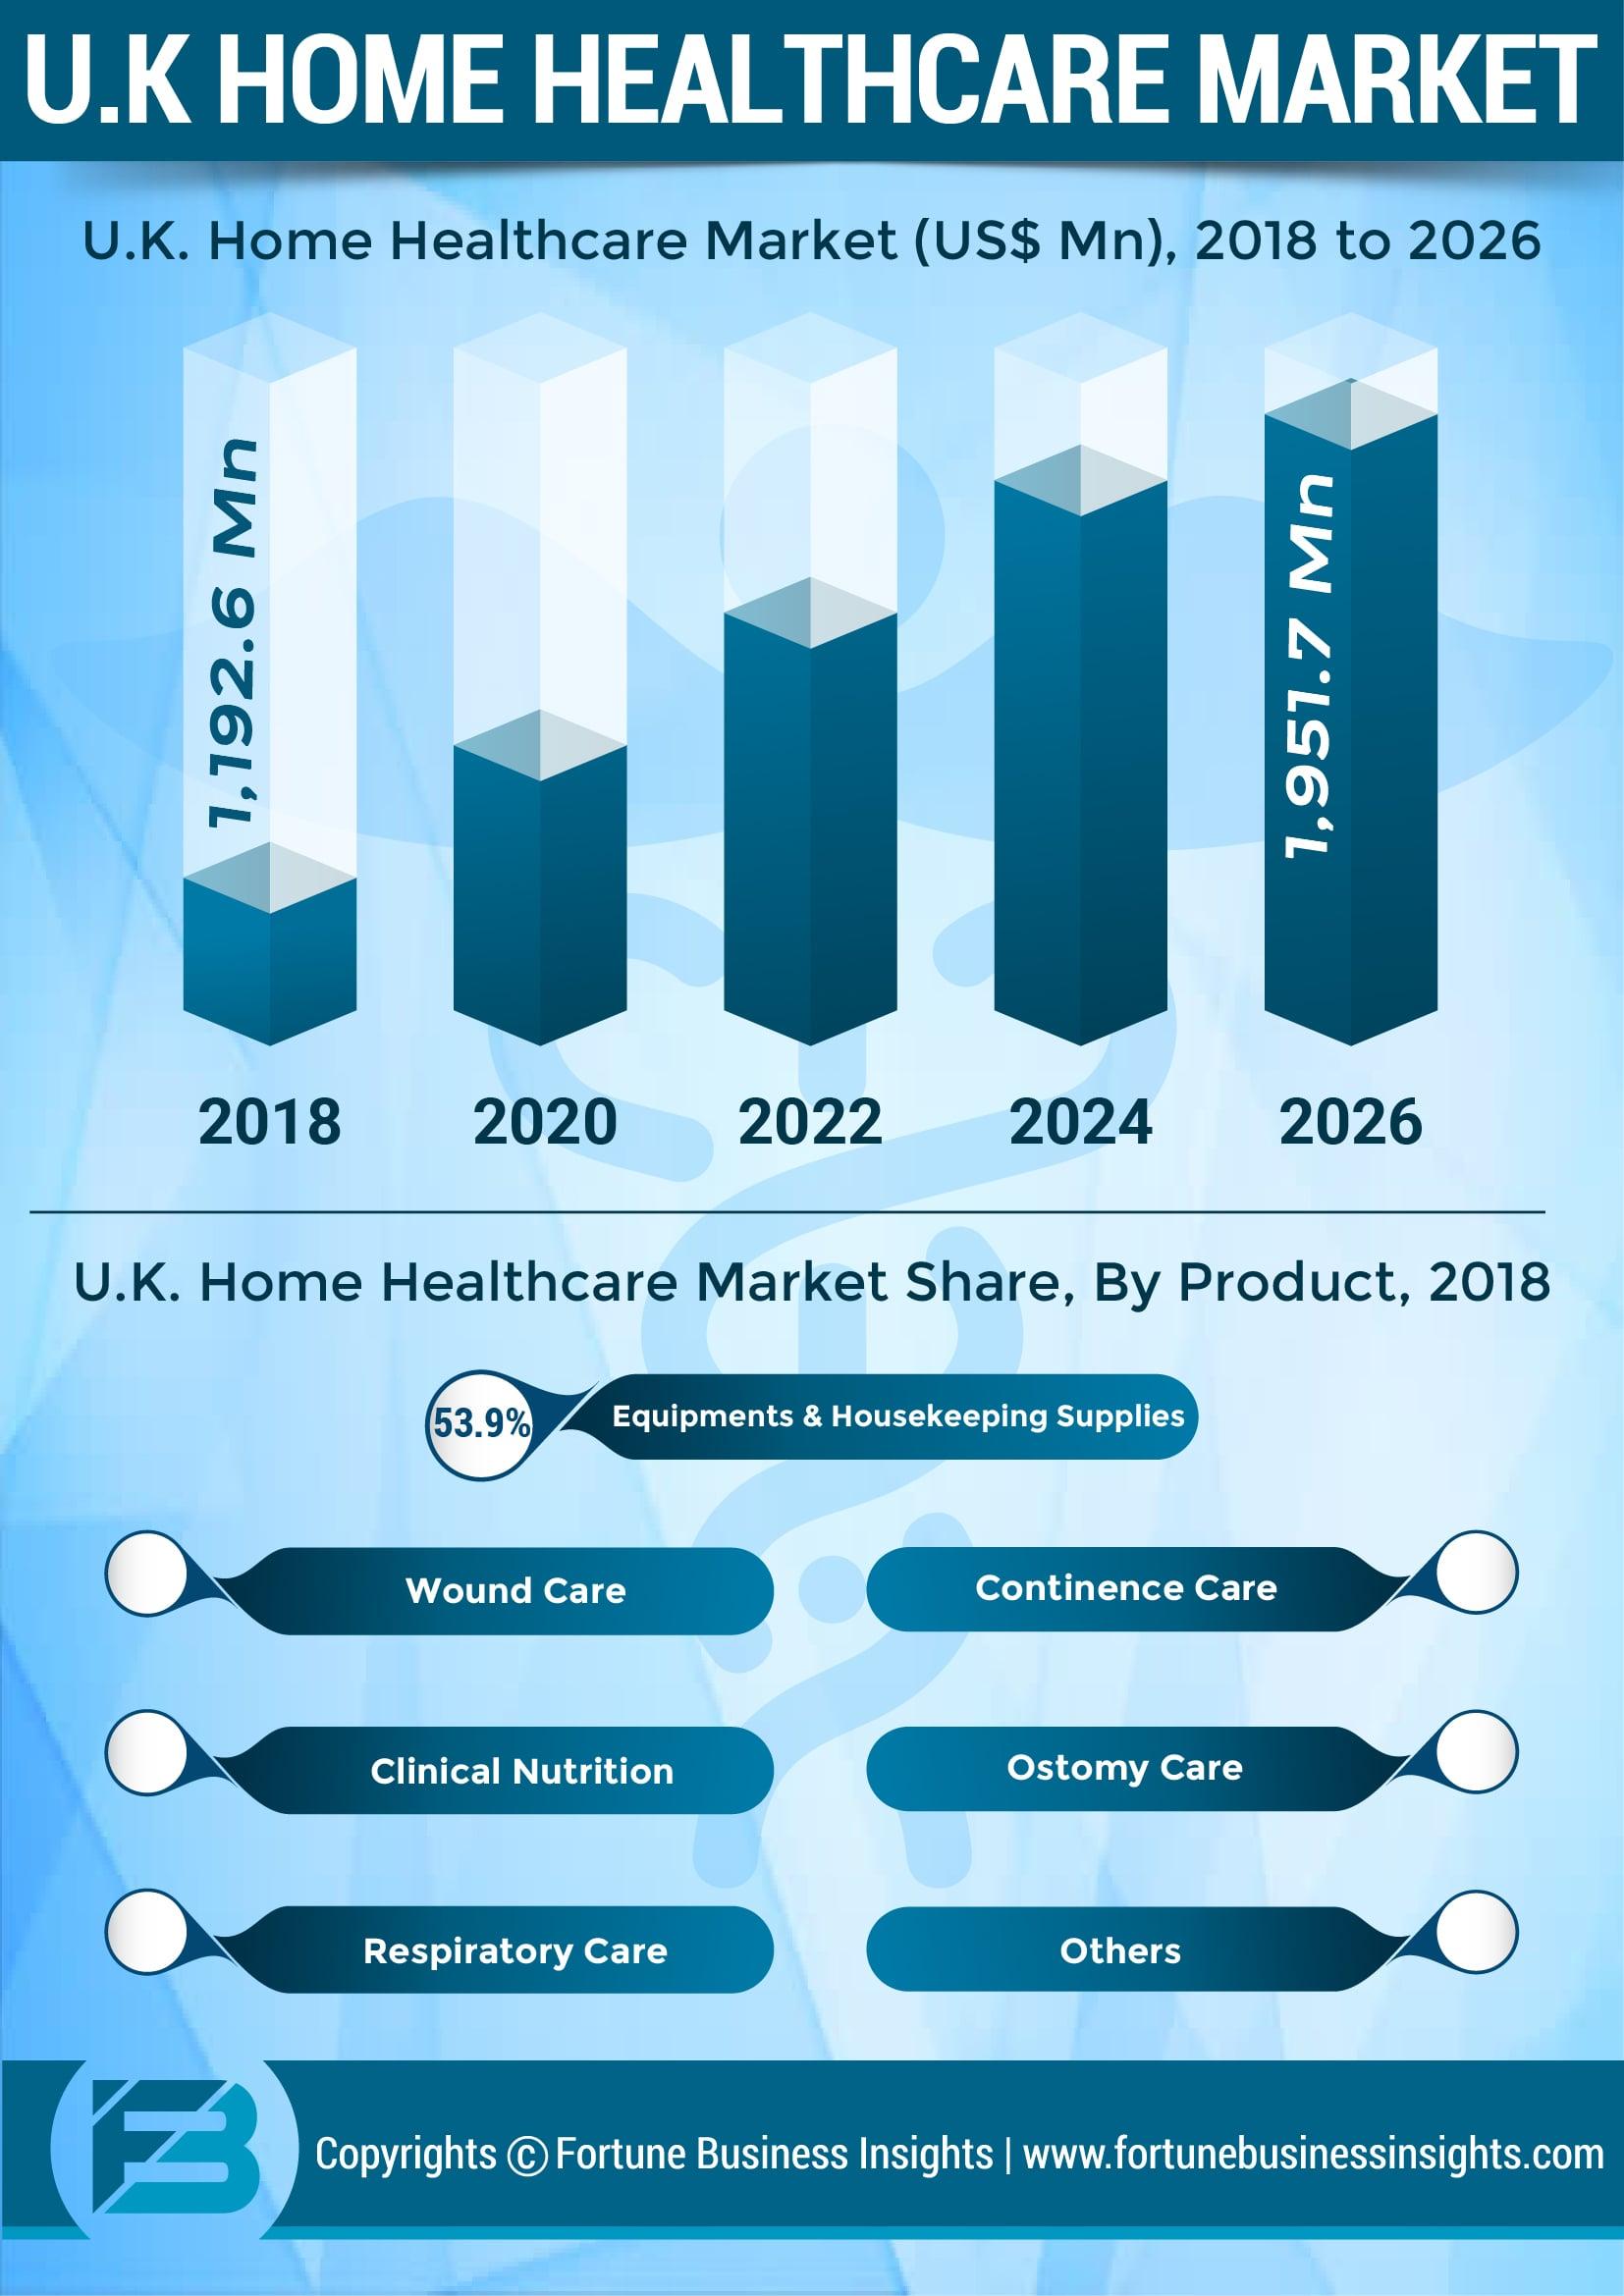 U.K. Home Healthcare Market